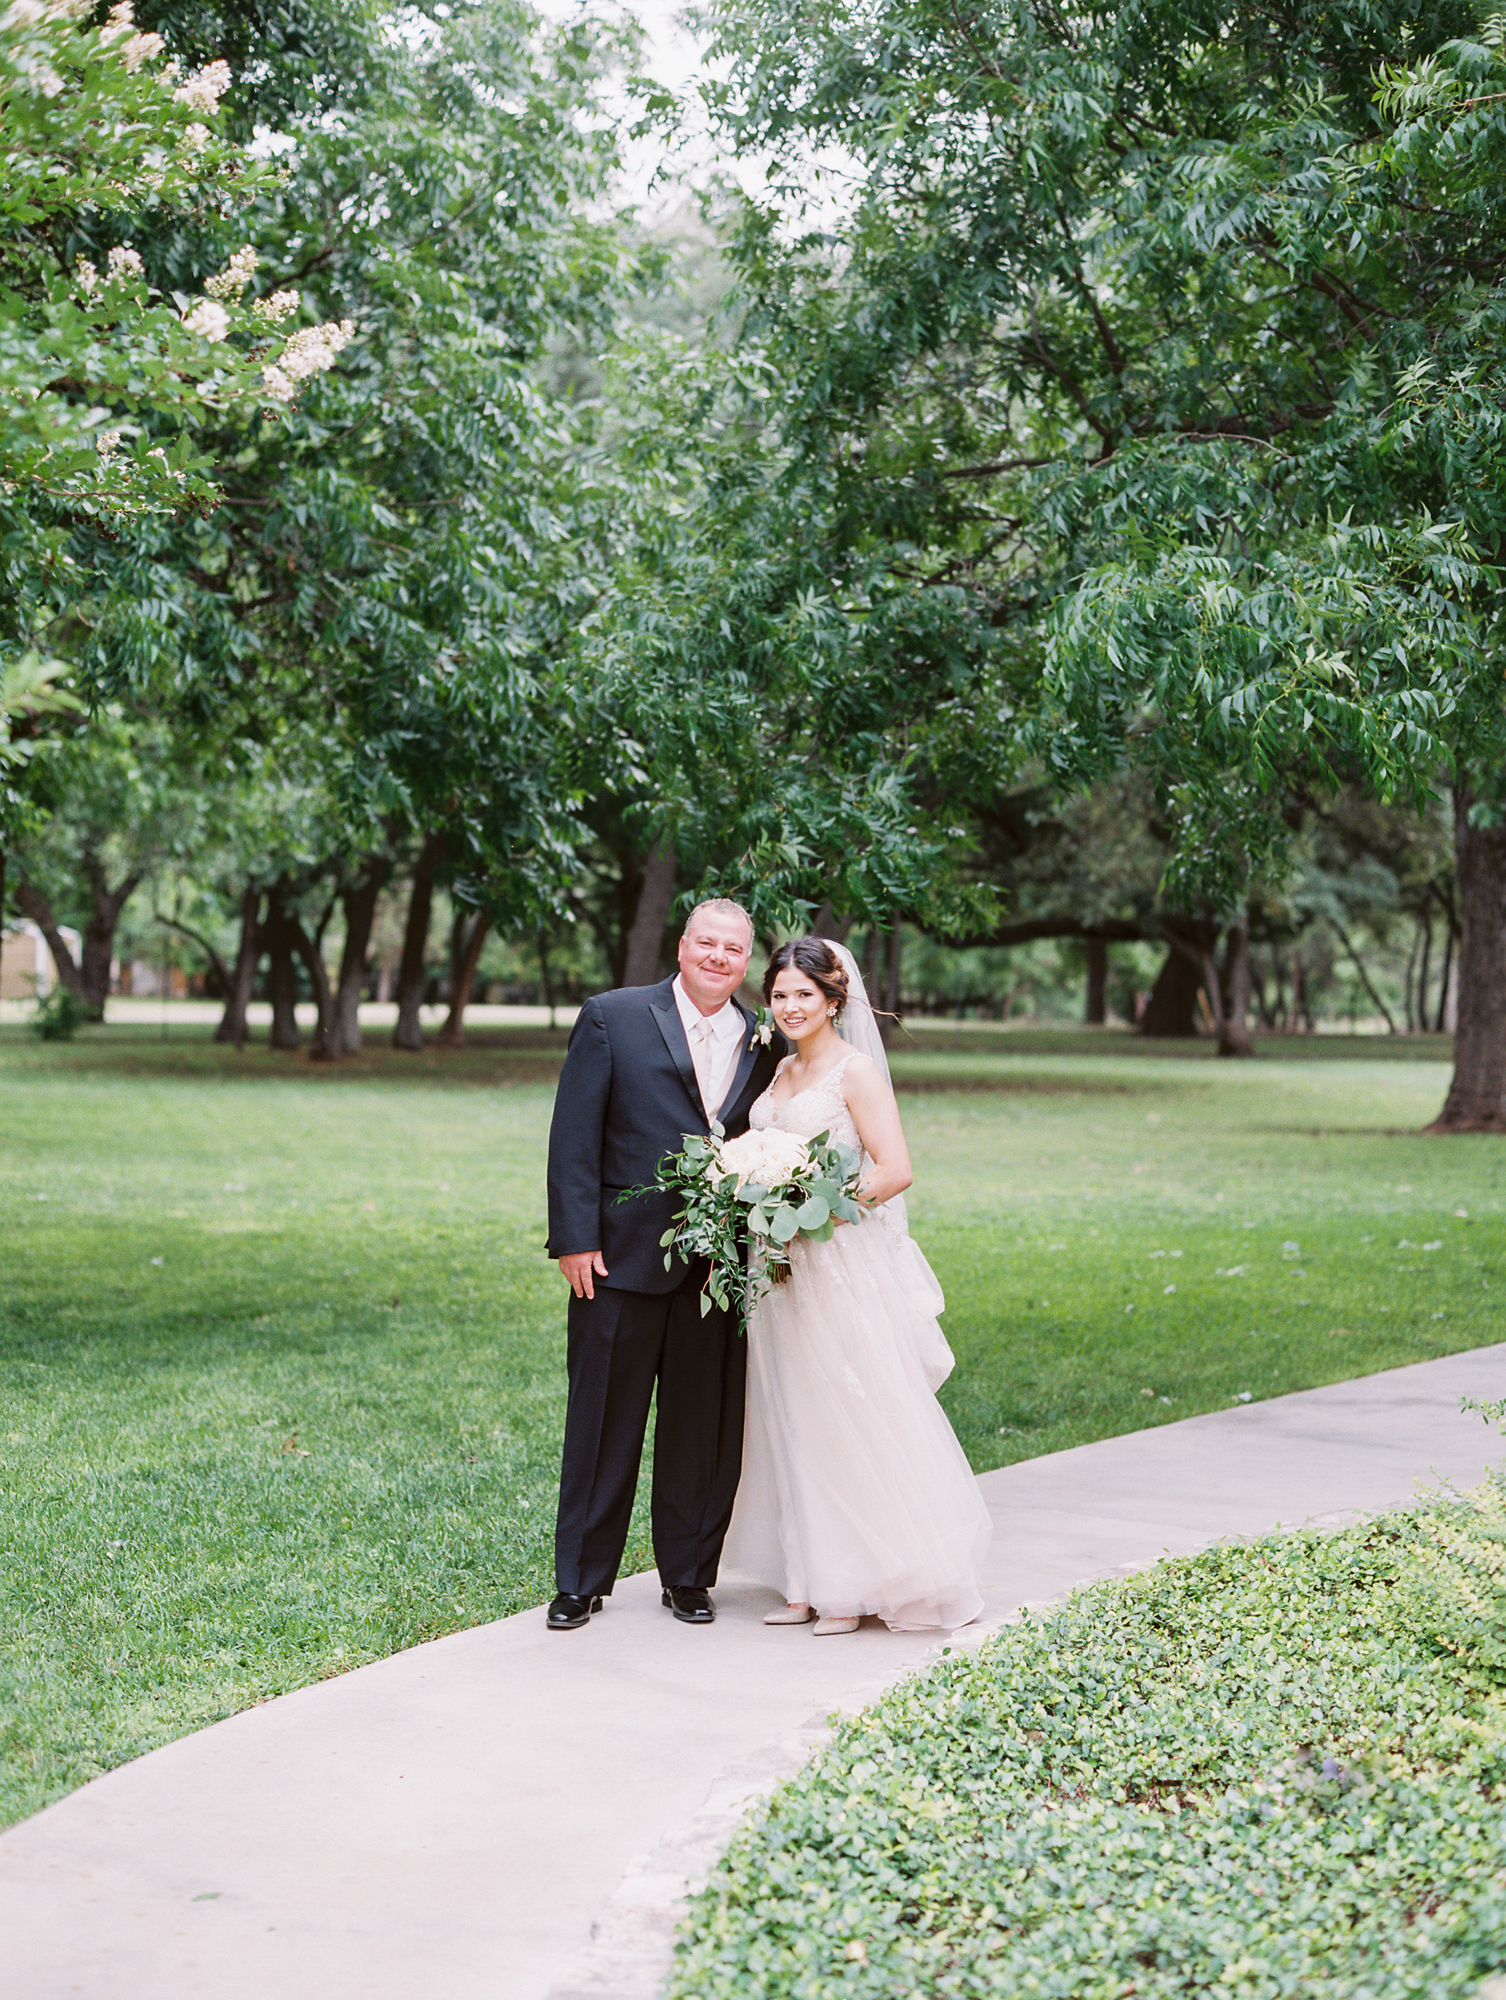 Elegant Spring Vineyard Wedding | Film Wedding Photographer | Austin Wedding Photographer | Bride and Father Sweet Moment | Britni Dean Photography // britnidean.com